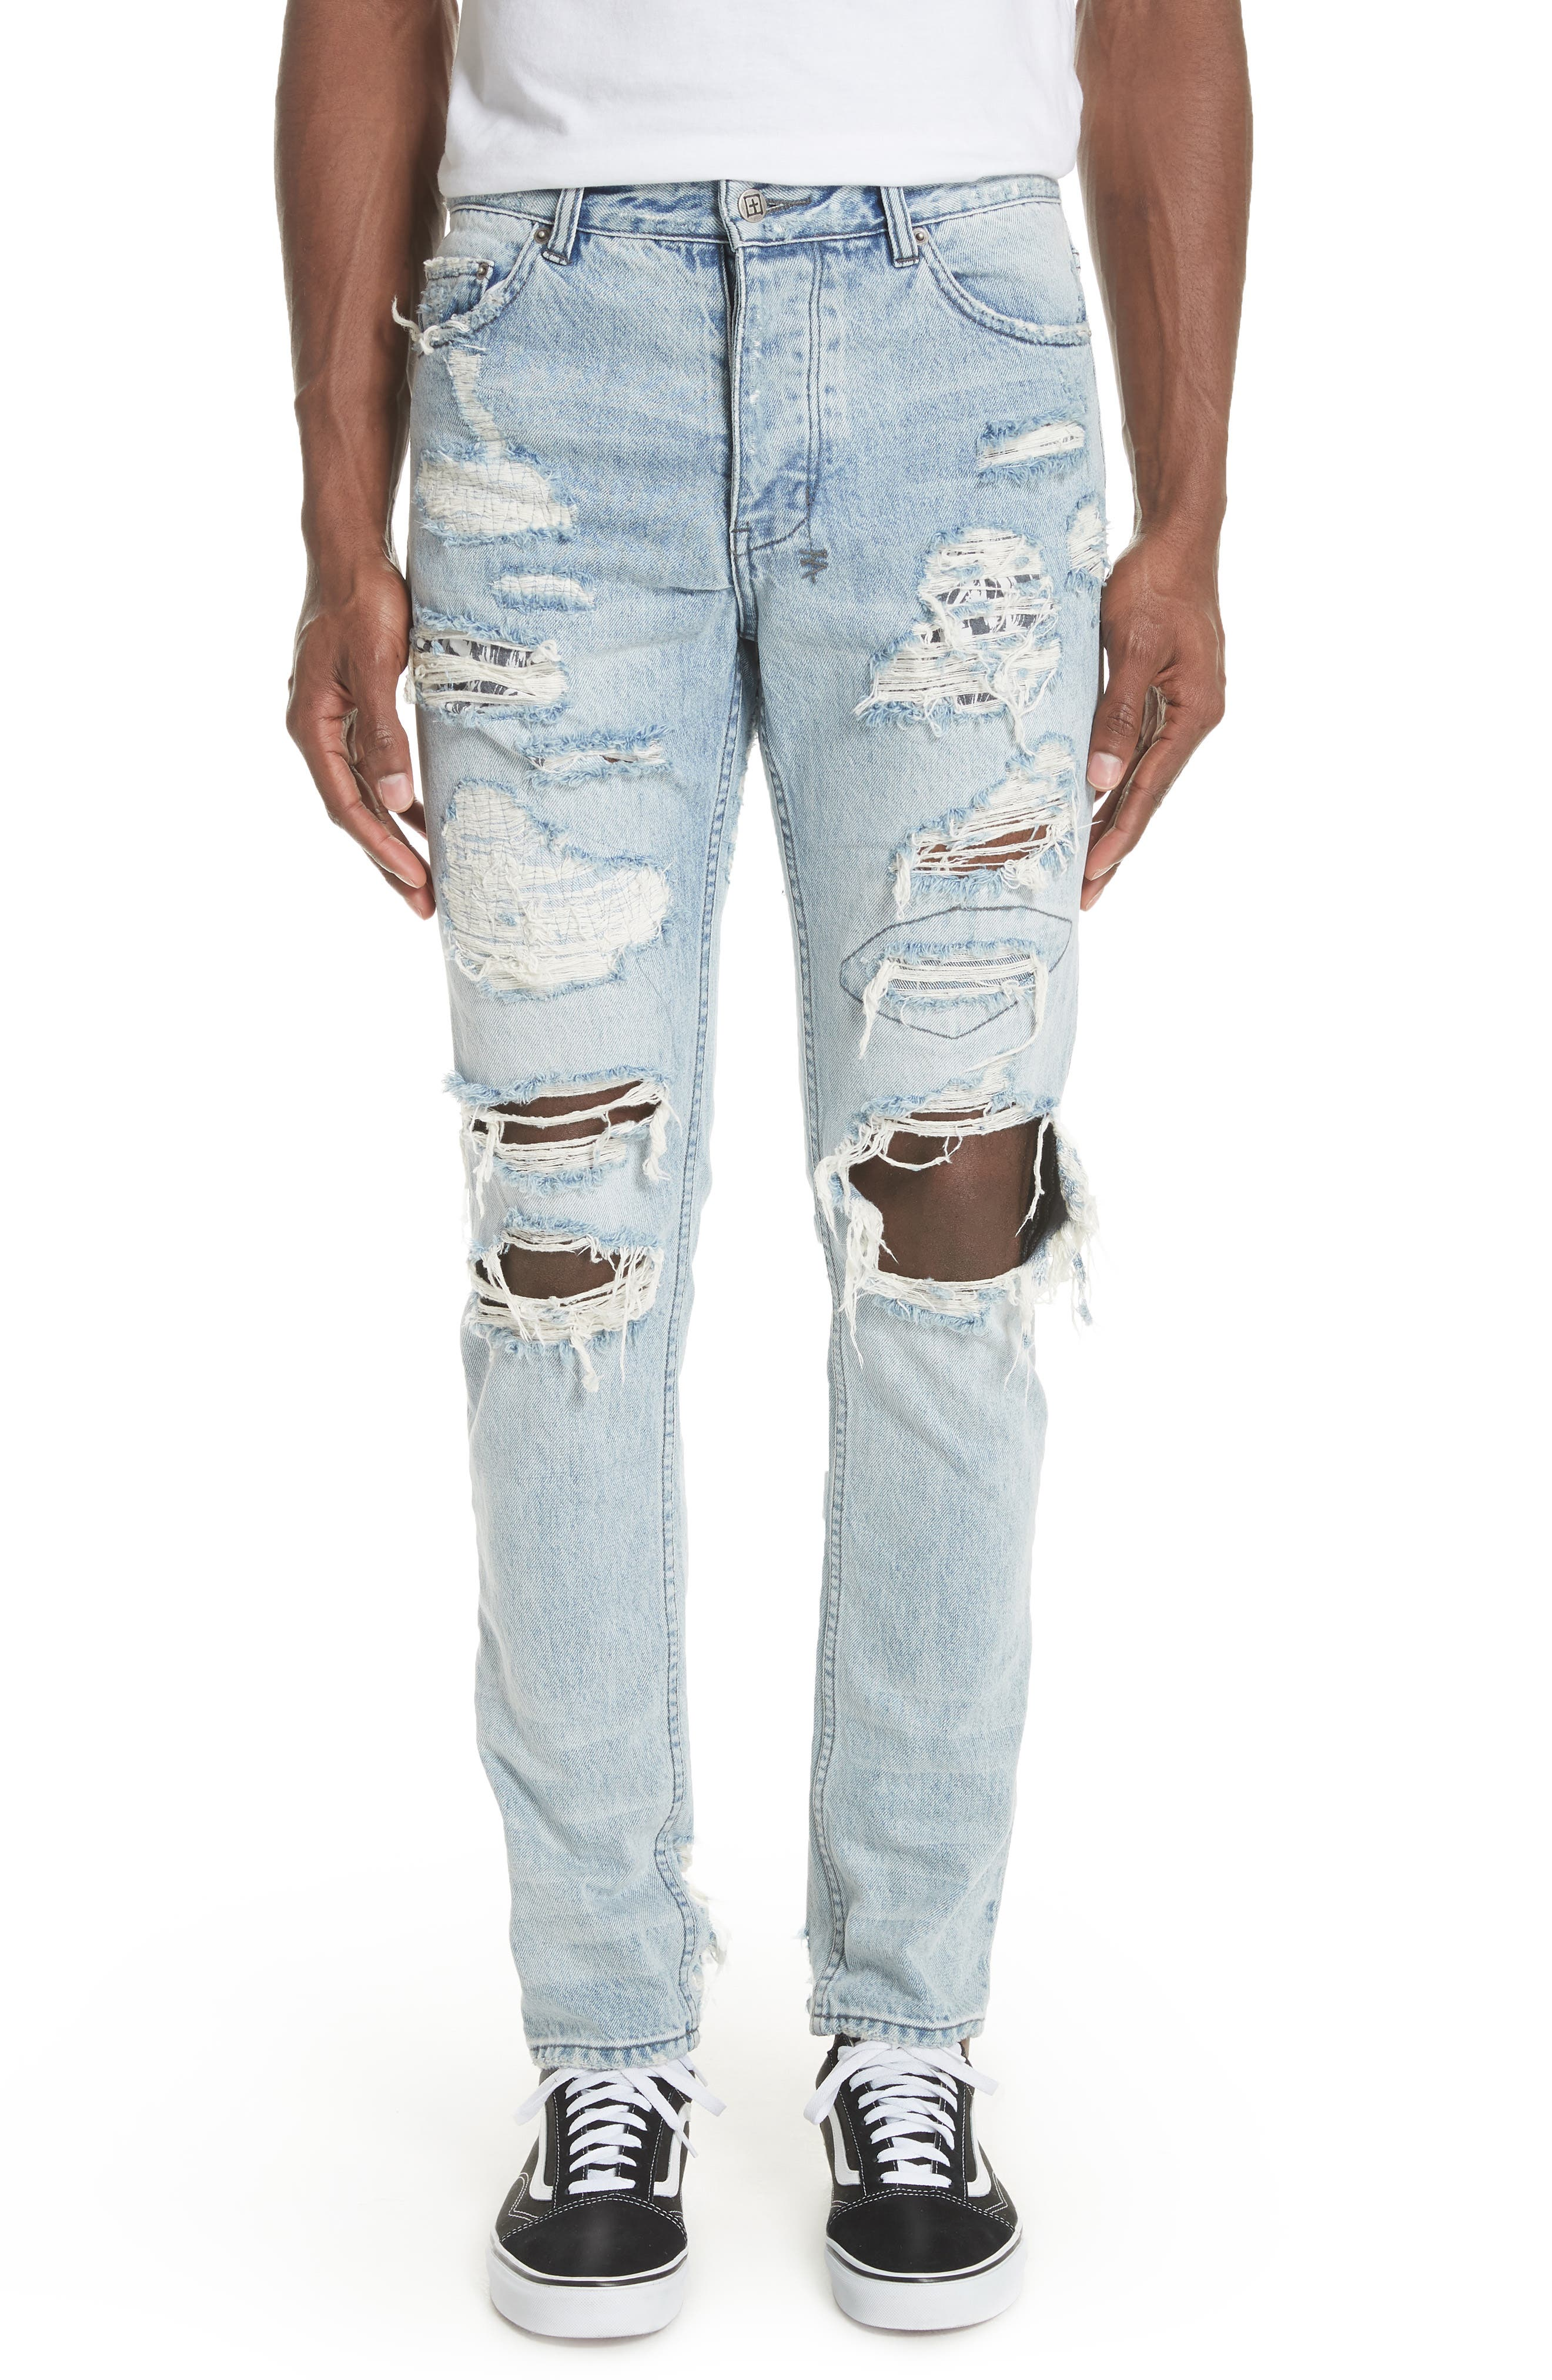 Chitch Tropo Trash Jeans,                             Main thumbnail 1, color,                             400